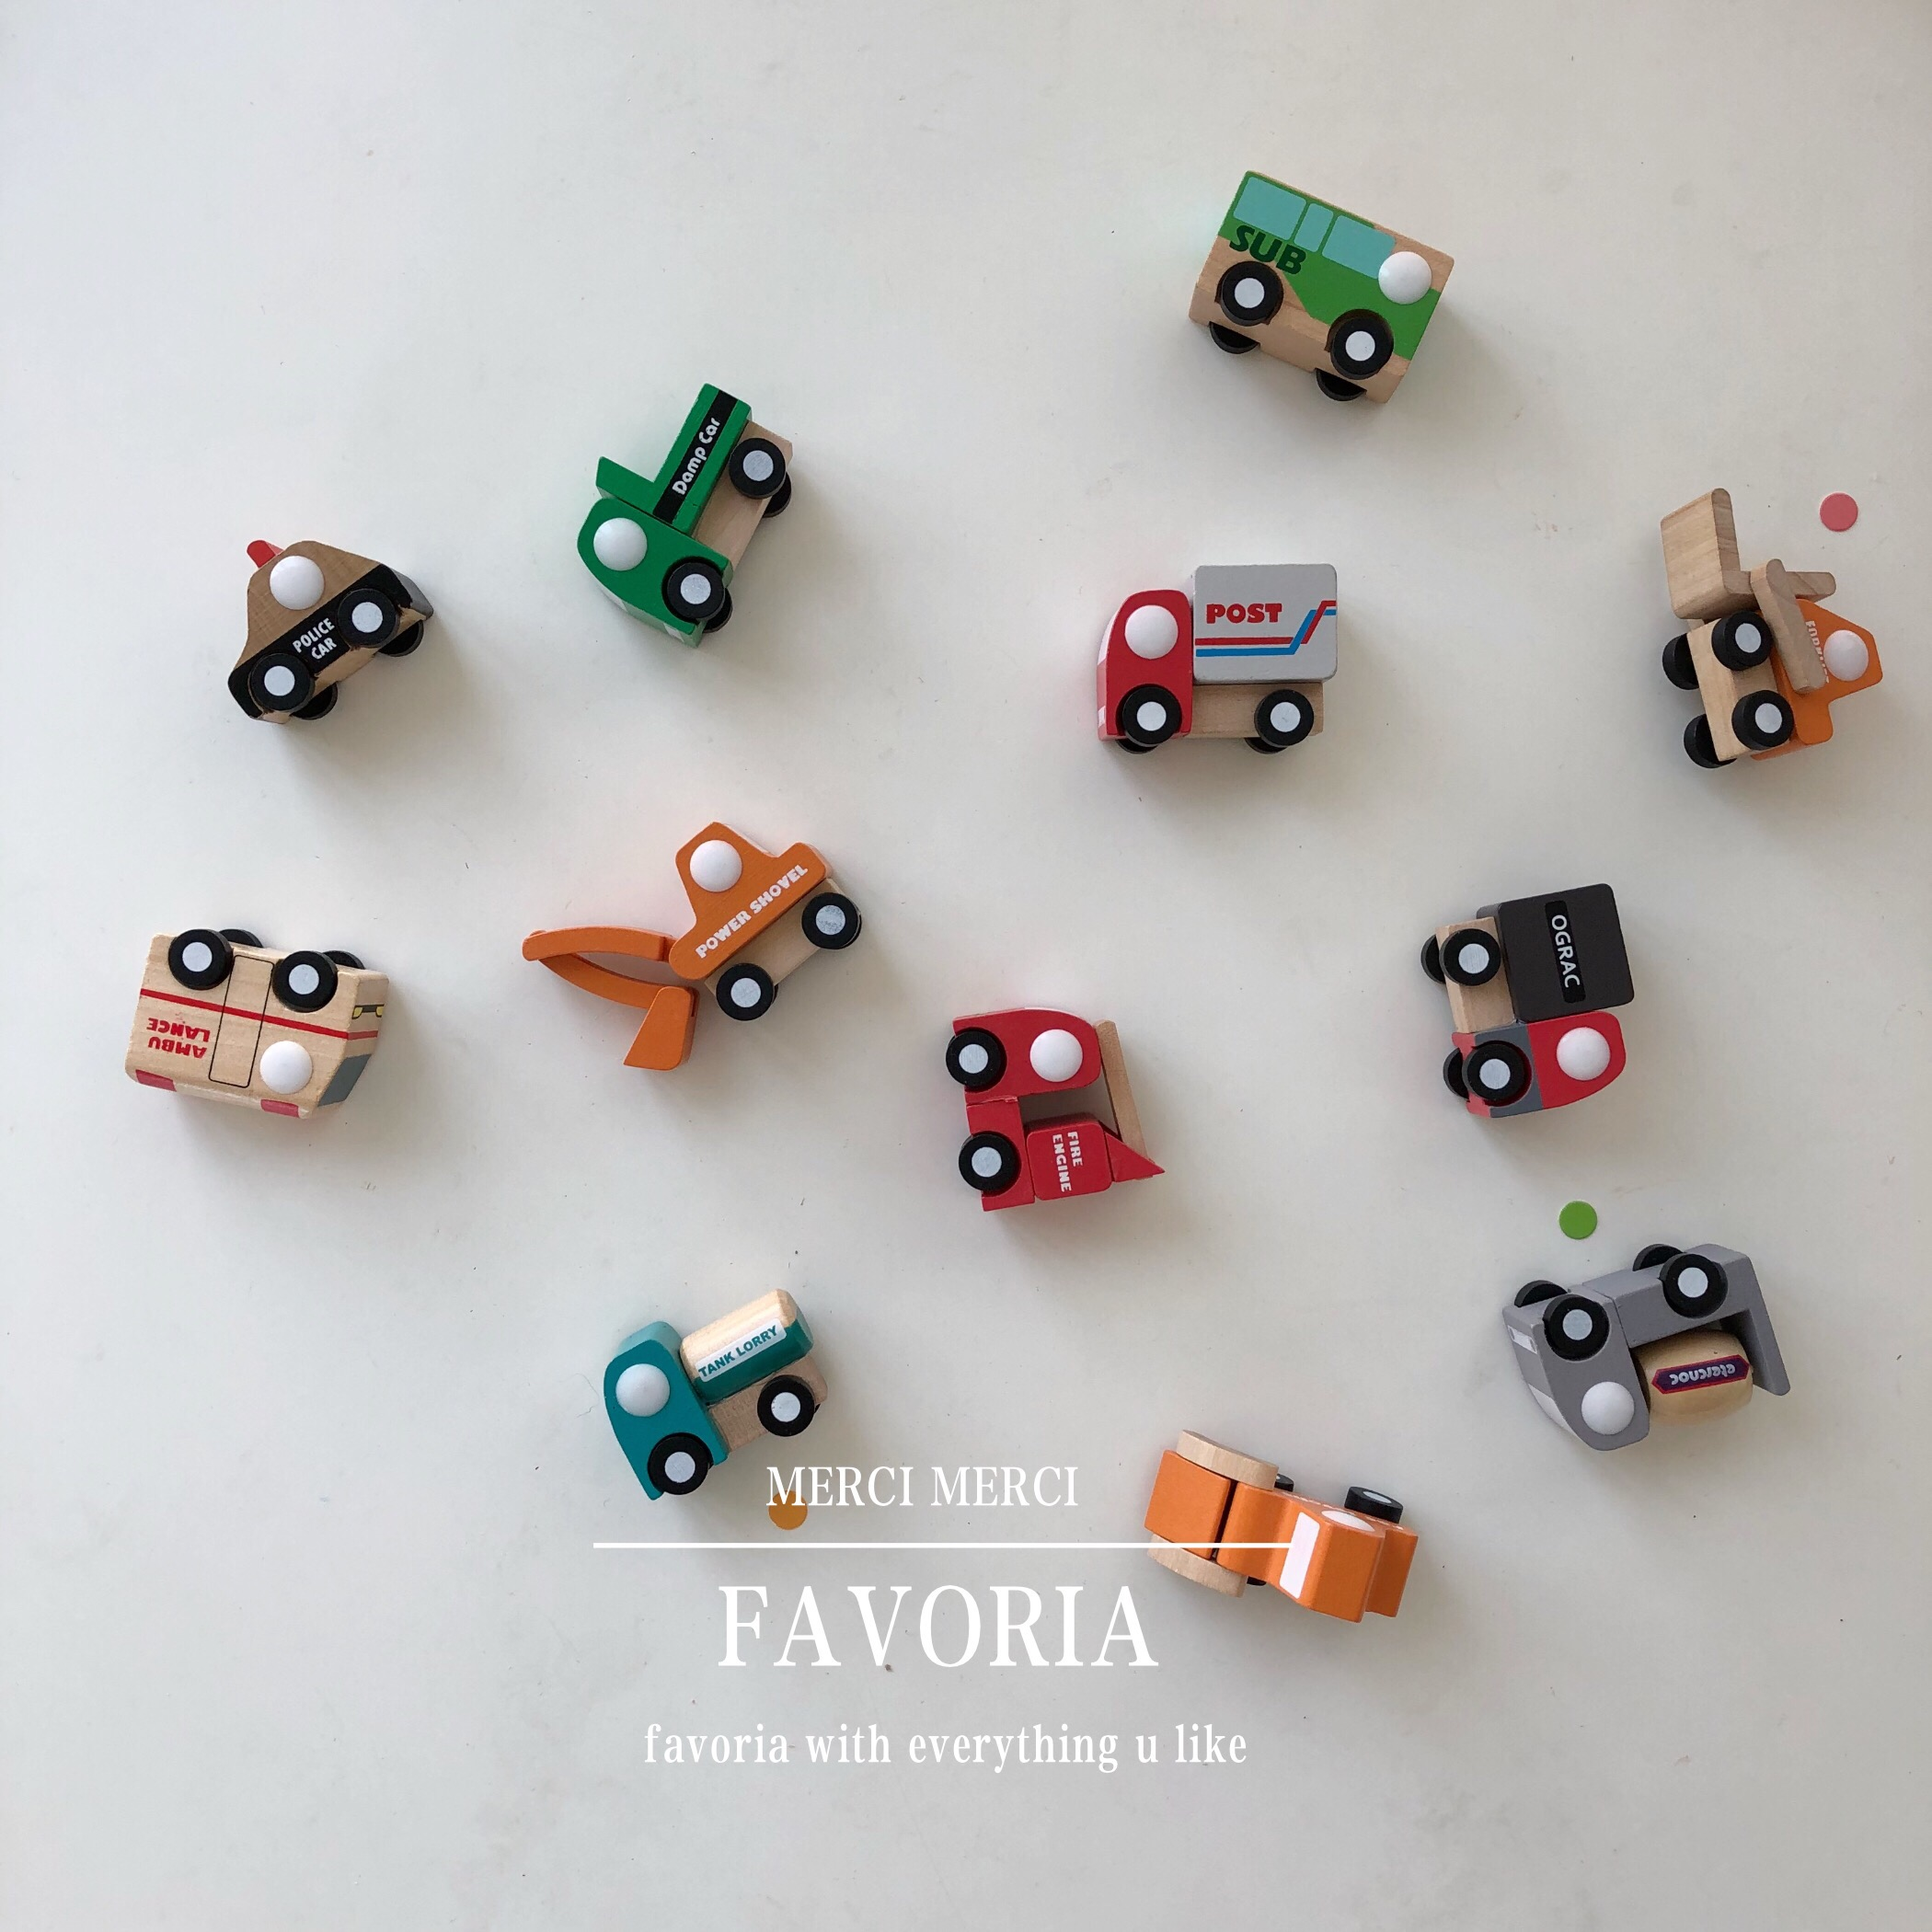 Favoria 北欧ins韩风宝宝儿童小汽车玩具木质 男孩玩具车模型礼物